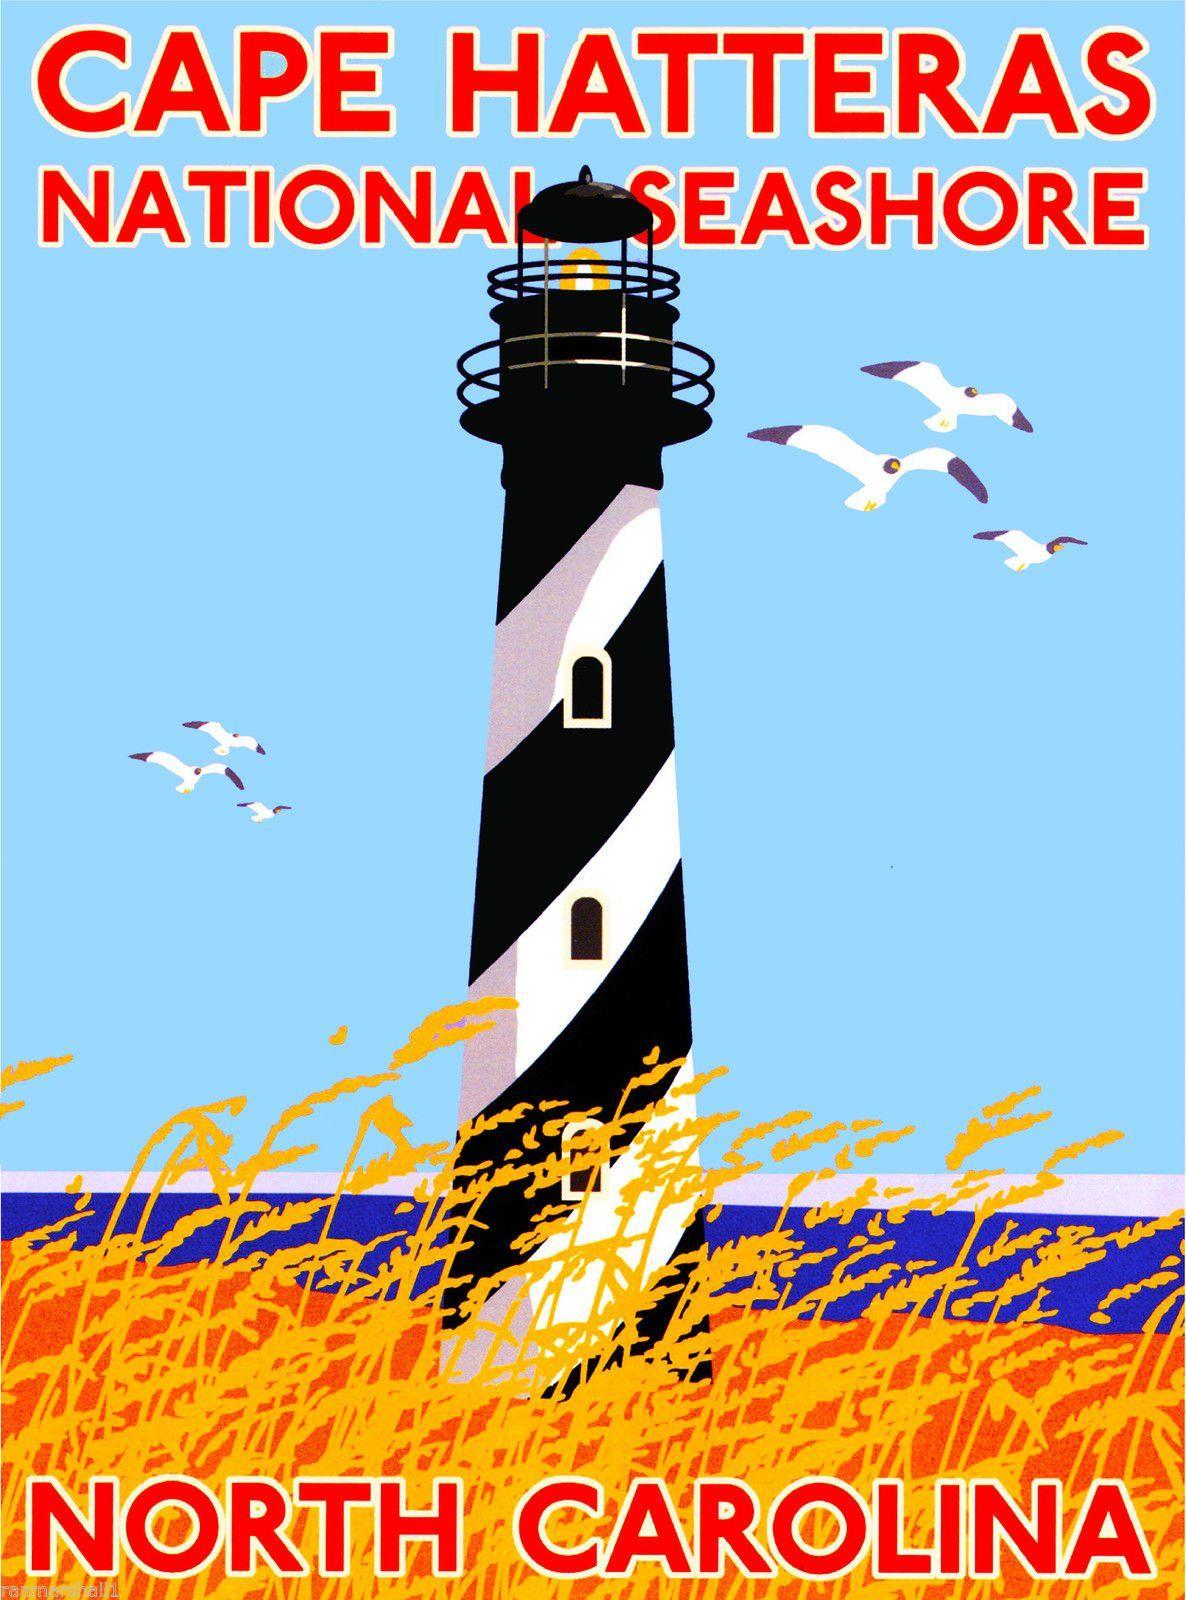 Cape Hatteras Seas North Carolina United States Travel Adver Poster